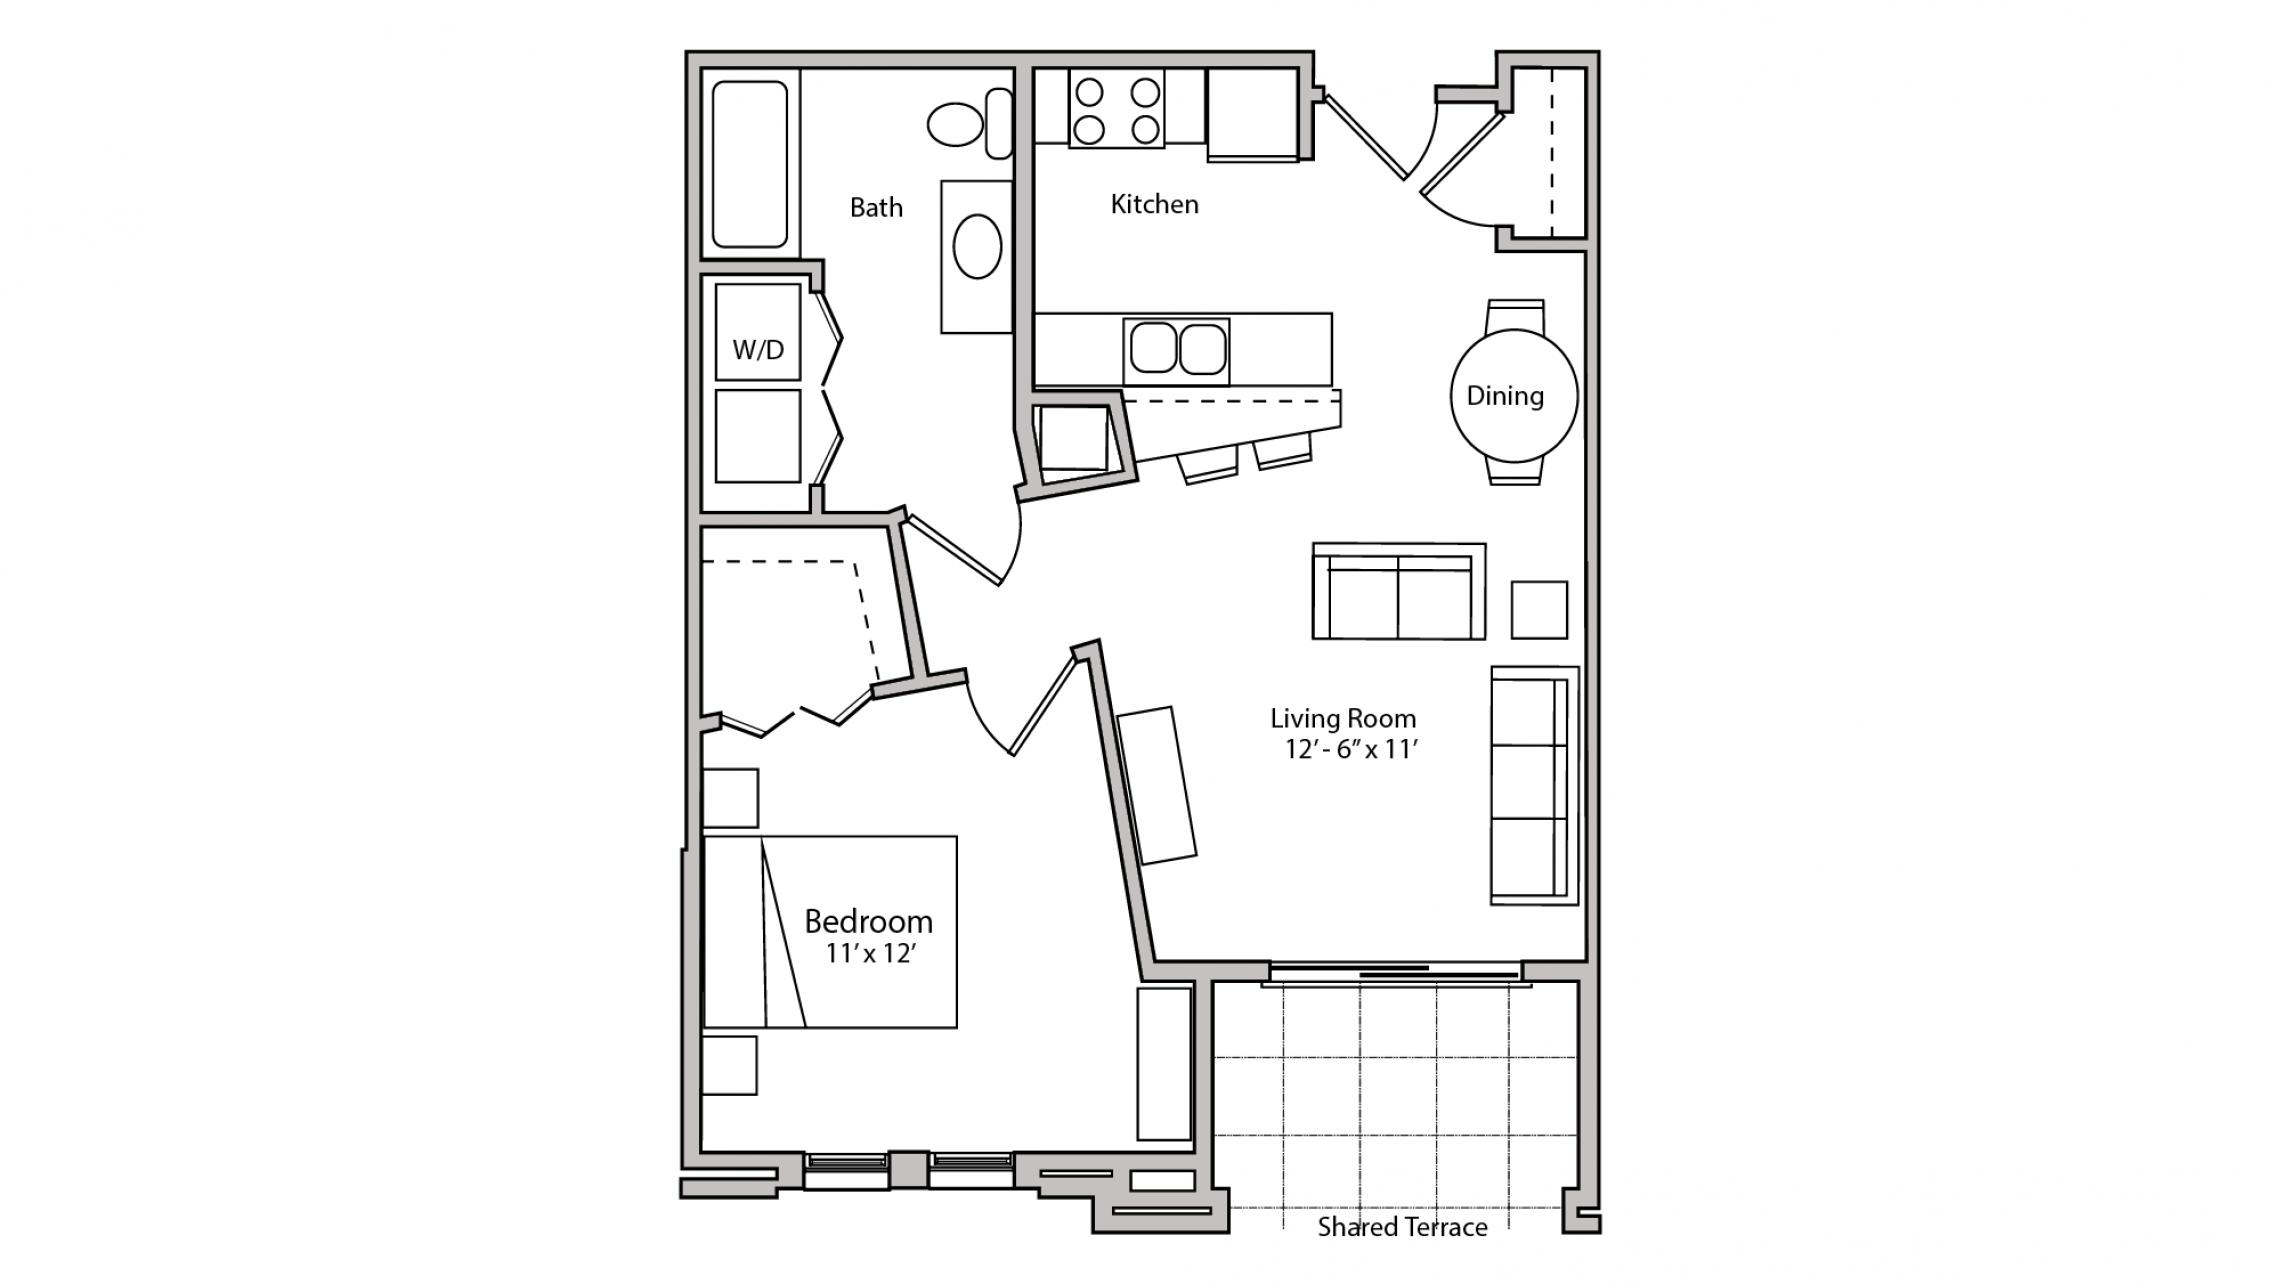 ULI The Depot 1-212 - One Bedroom, One Bathroom